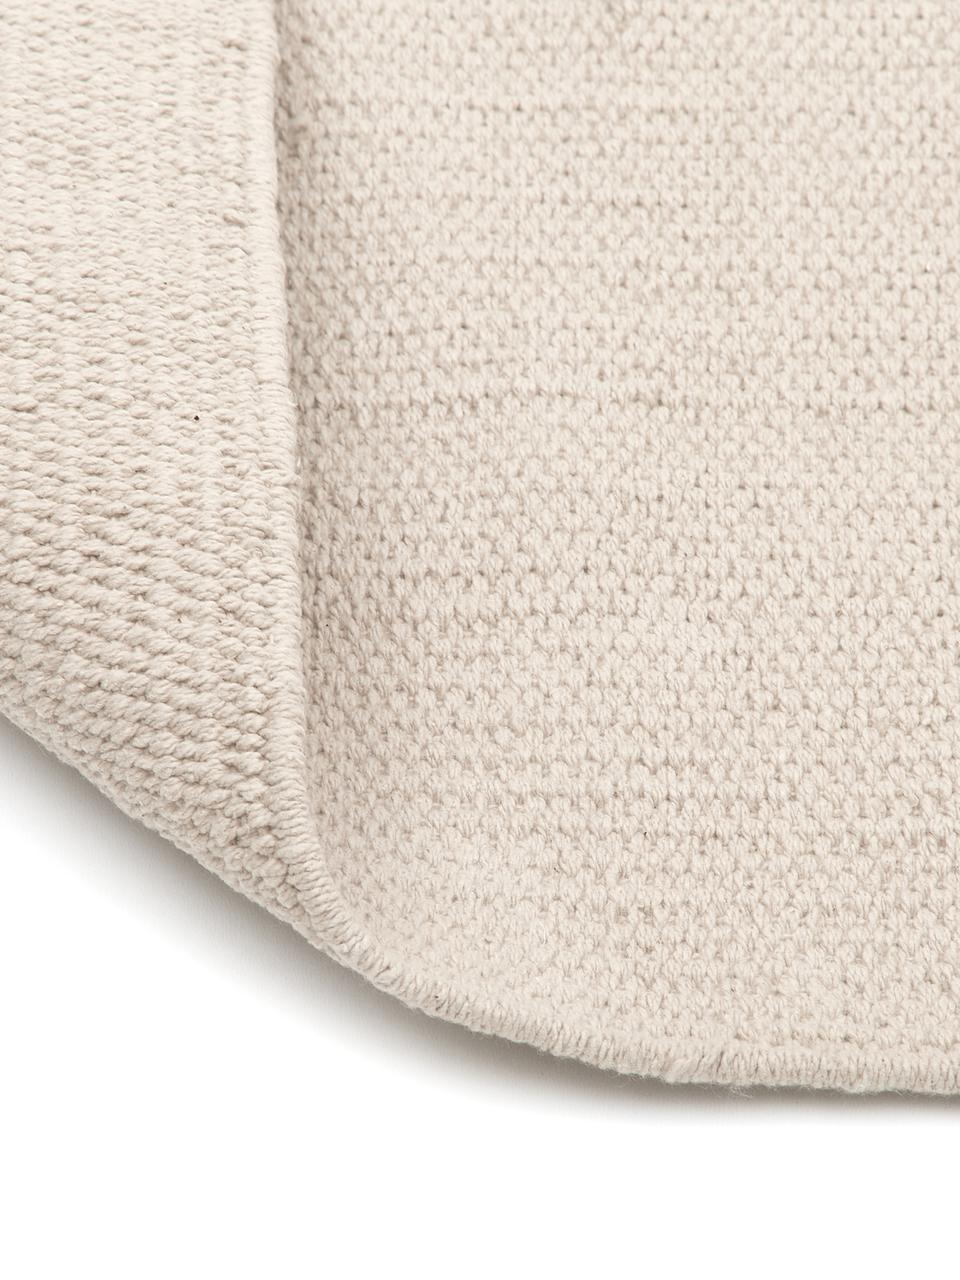 Dun handgeweven katoenen vloerkleed Agneta, Katoen, Beige, B 200 x L 300 cm (maat L)